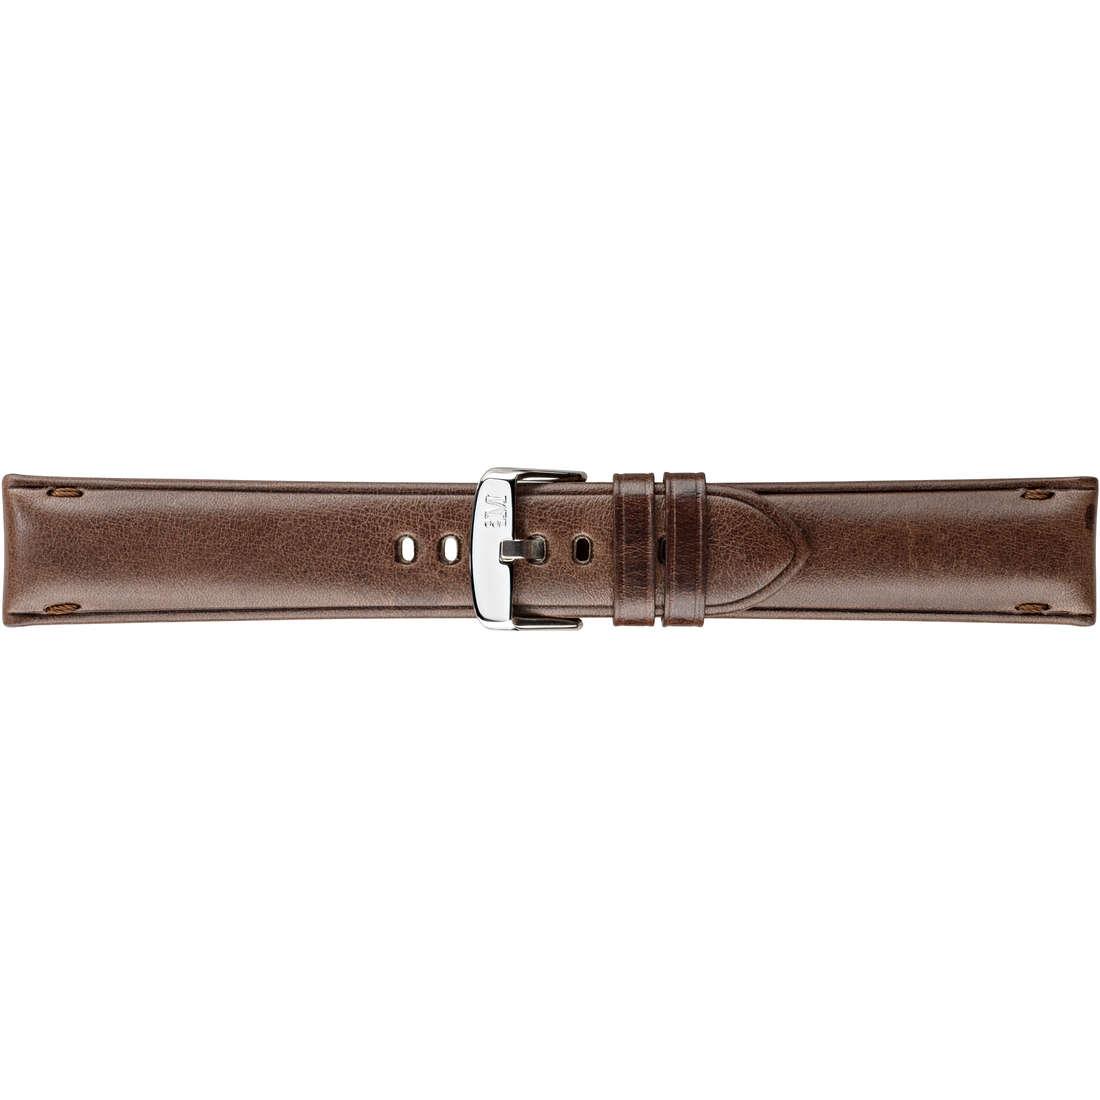 watch watch bands watch straps man Morellato Manufatti A01X4685B71034CR22